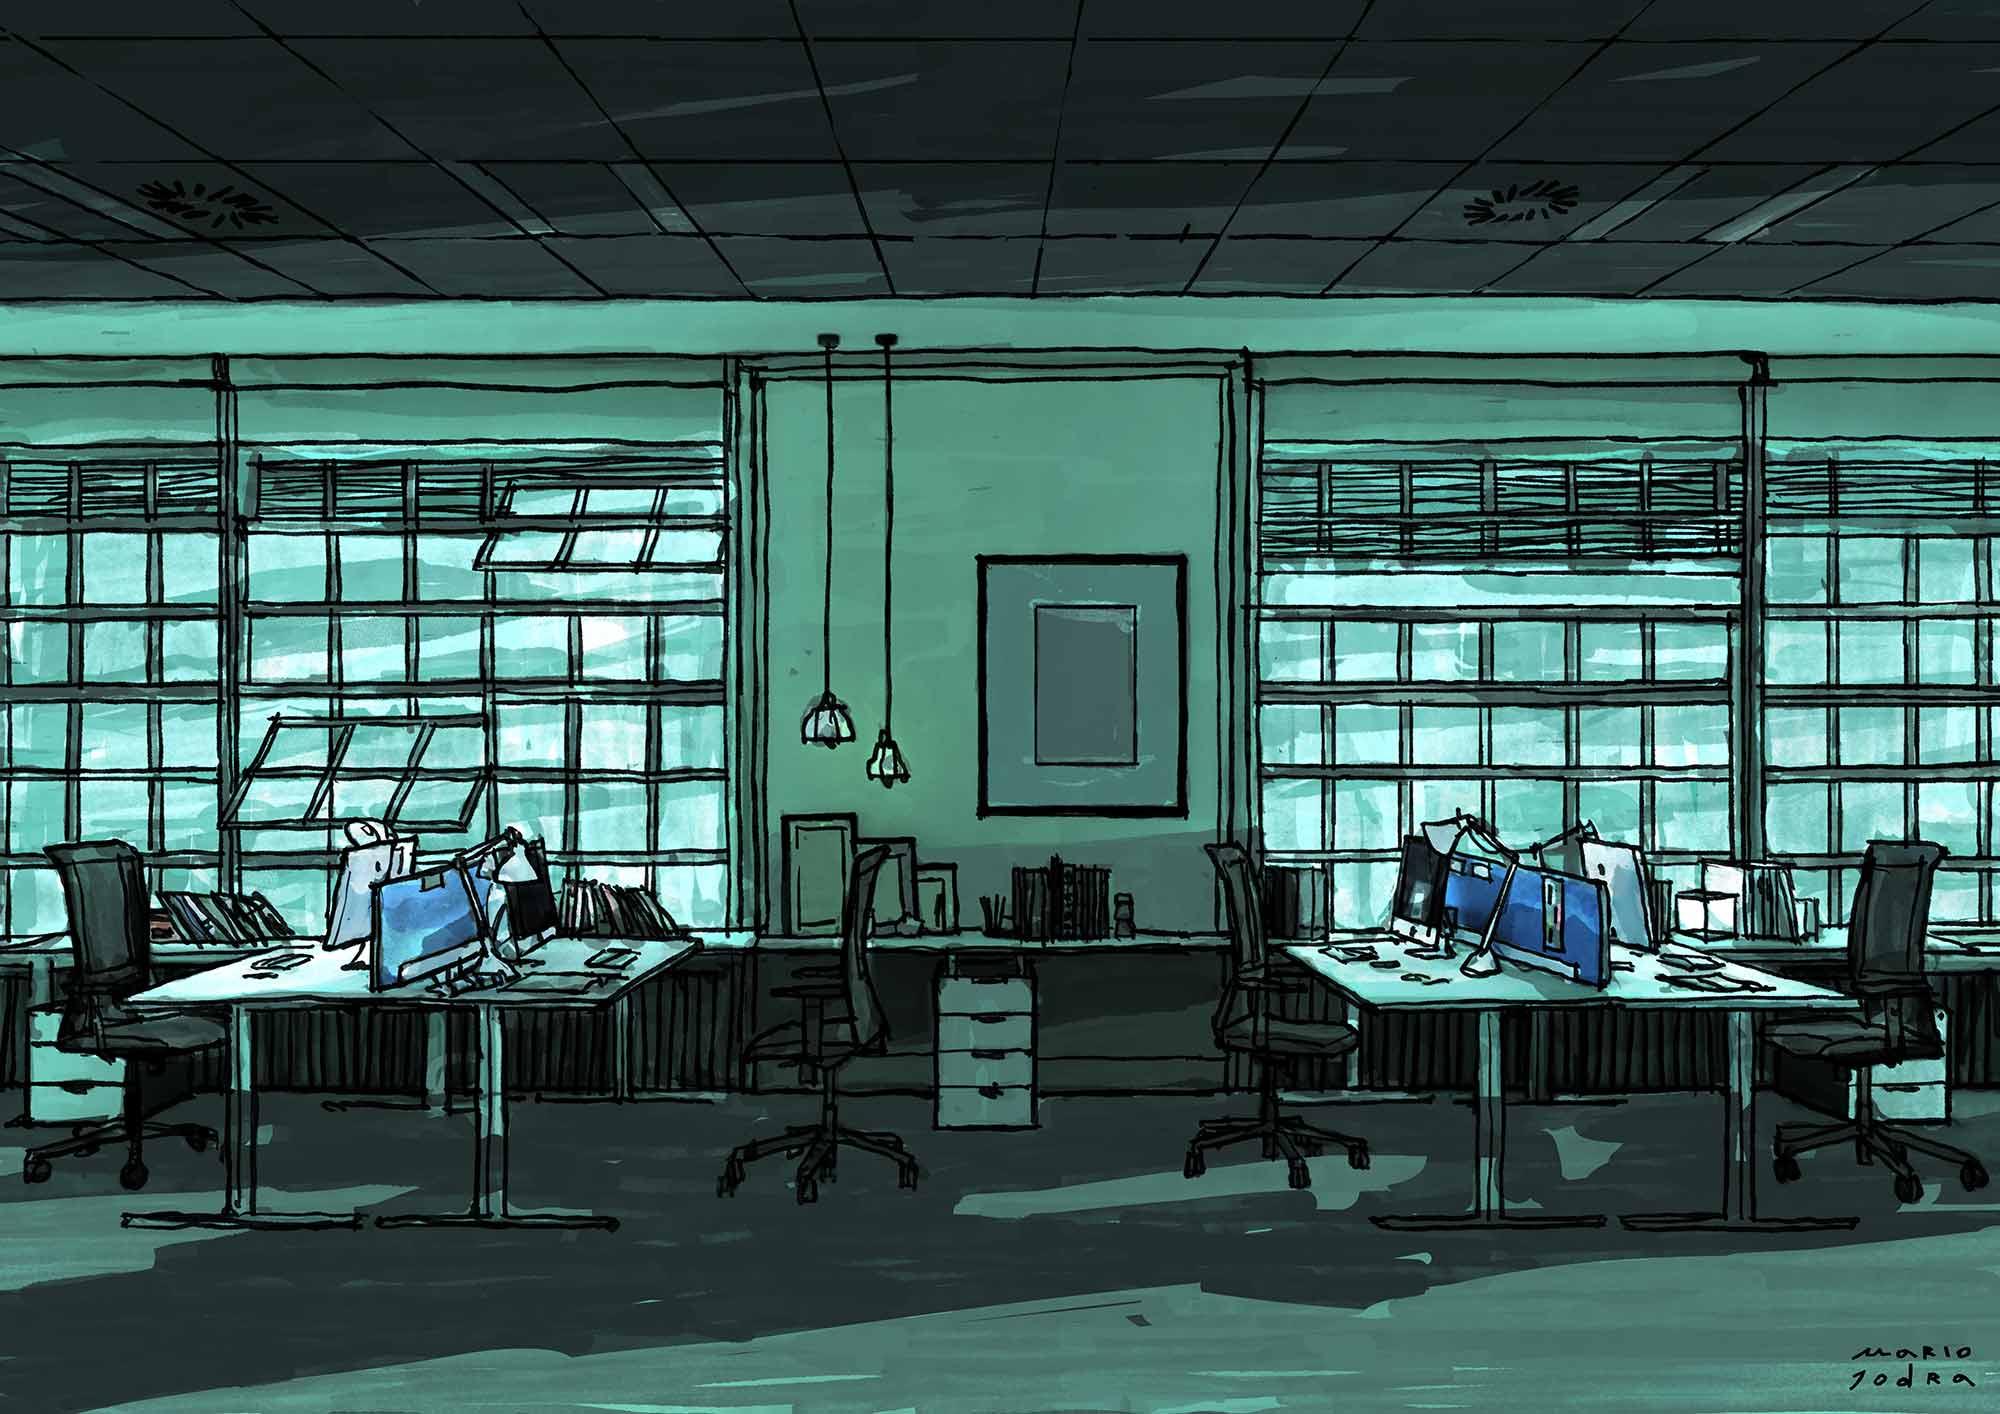 Mario Jodra illustration - Office view